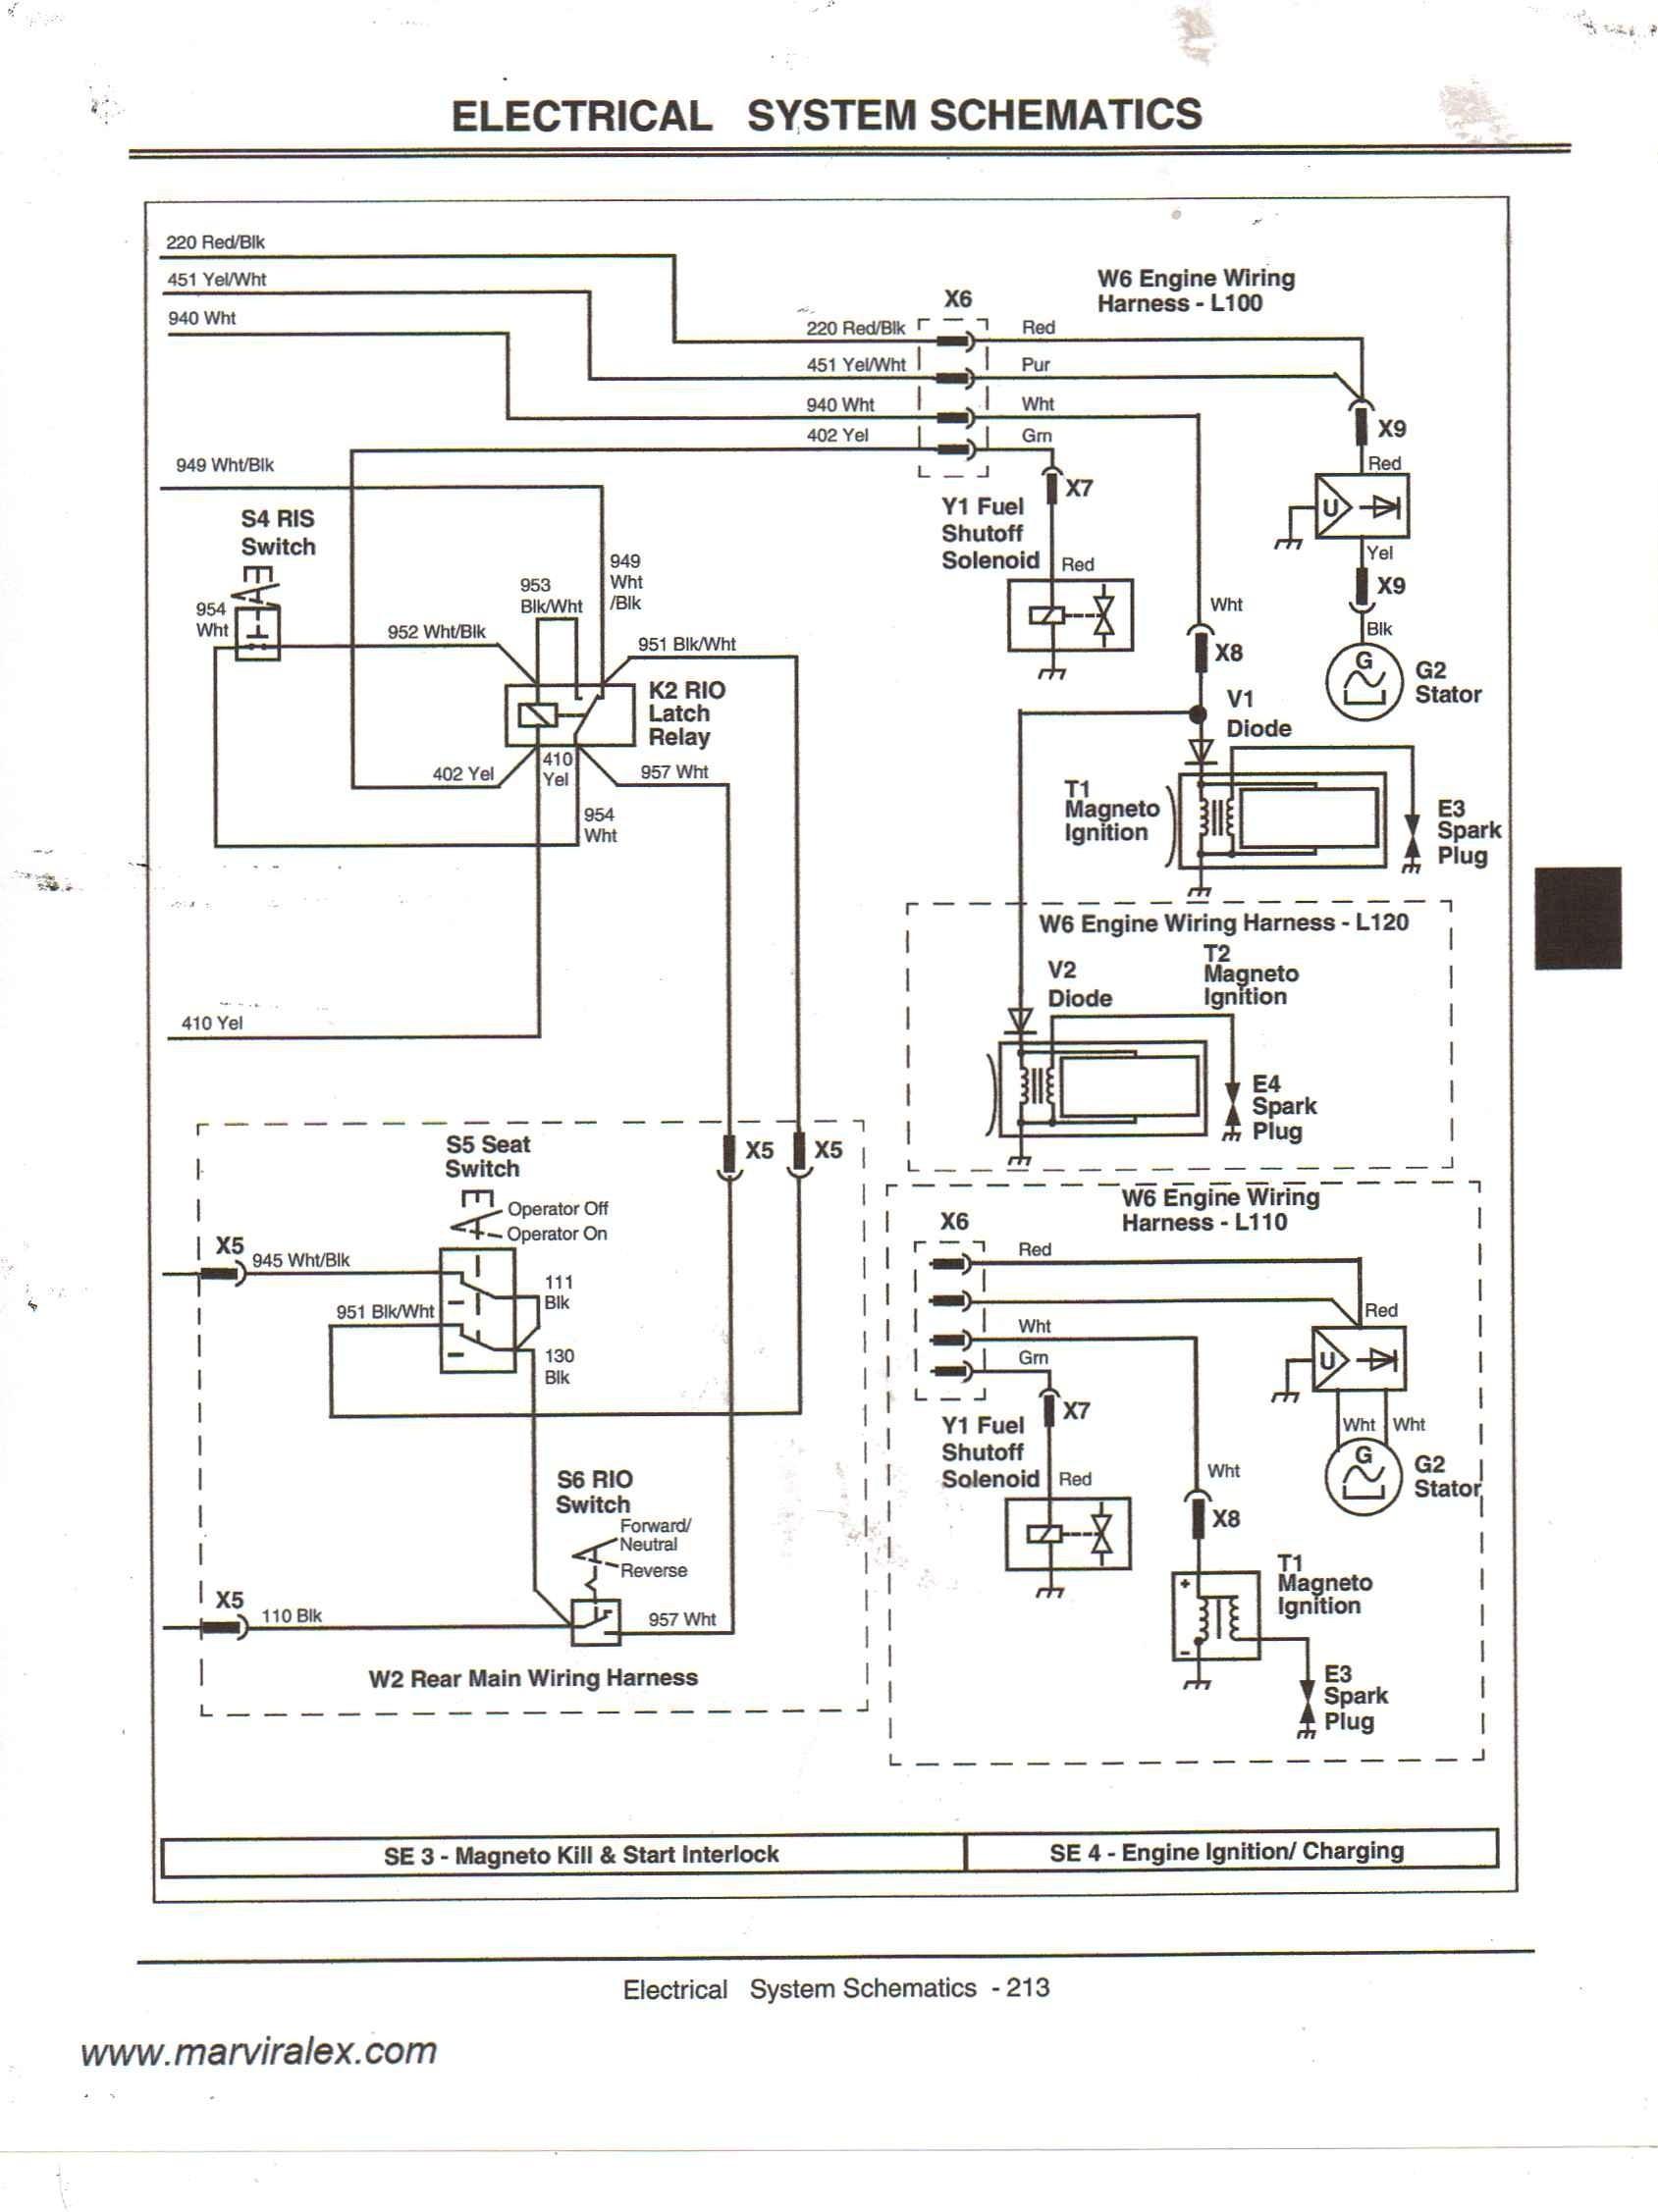 Wireing Diagram for John Deere 345 Nd 2800] Wiring Diagram John Deere F525 Also John Deere F525 Of Wireing Diagram for John Deere 345